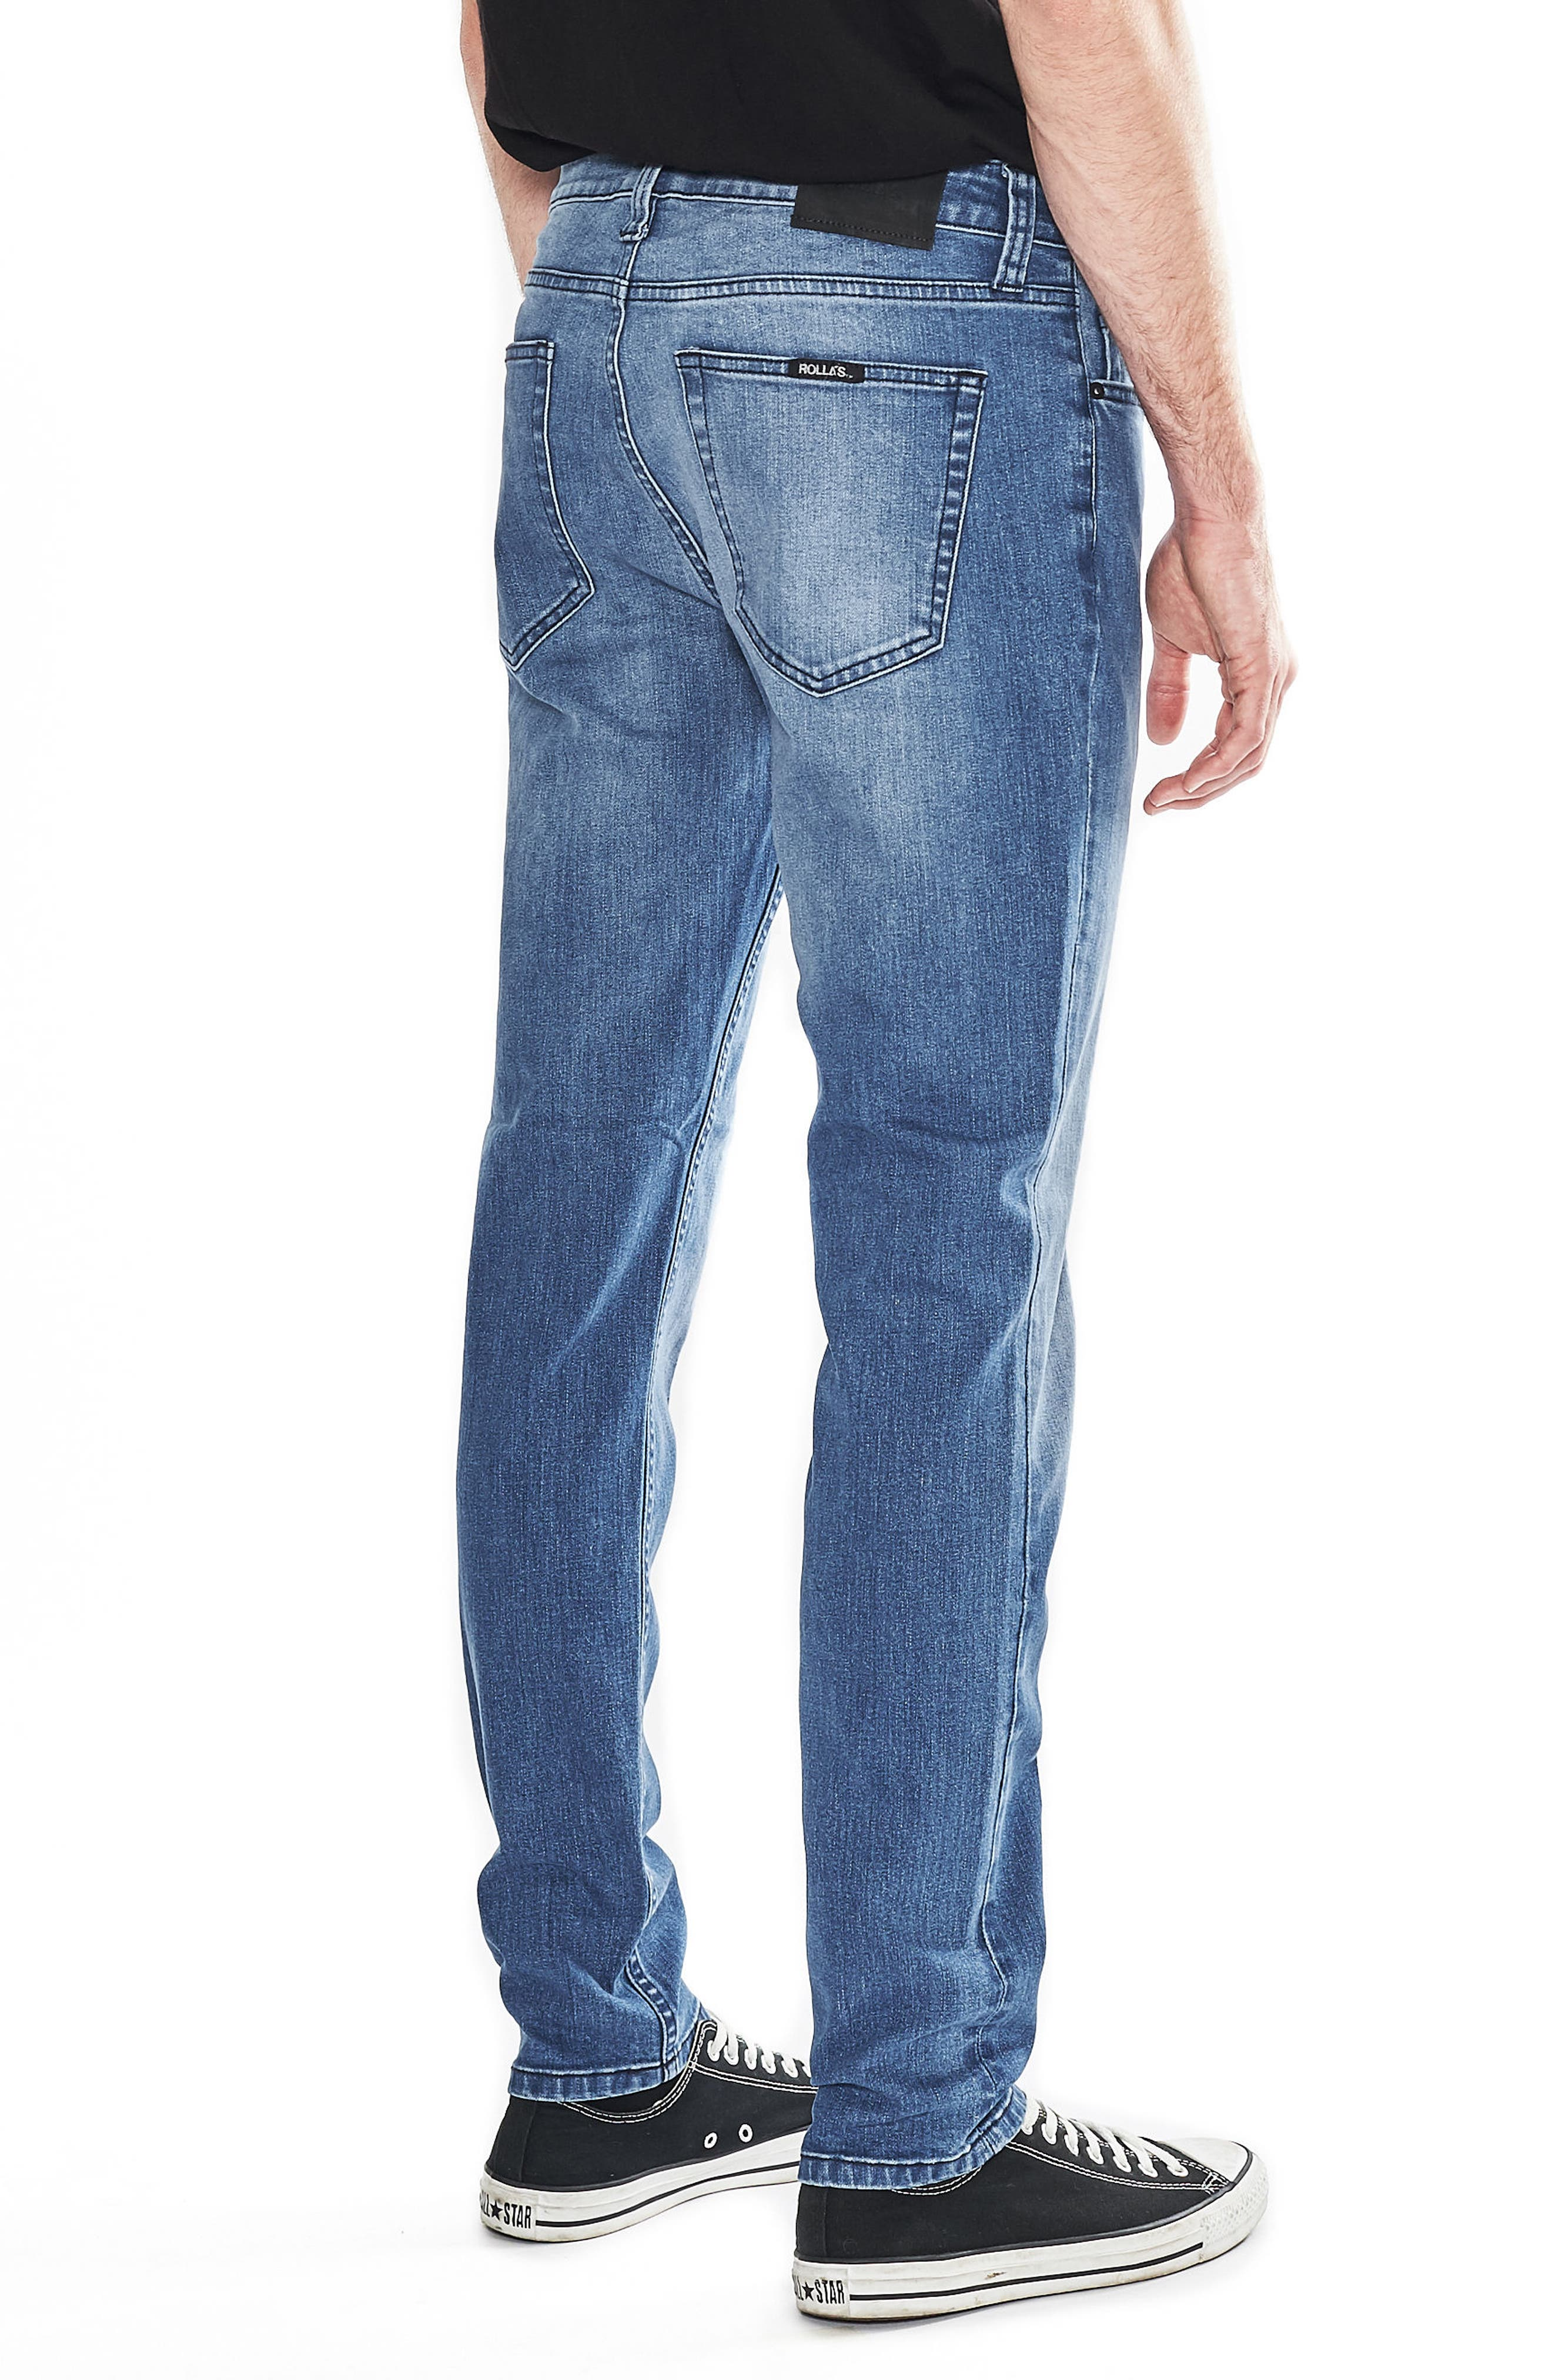 Tim Slims Slim Fit Jeans,                             Alternate thumbnail 3, color,                             Safety Beach Blue